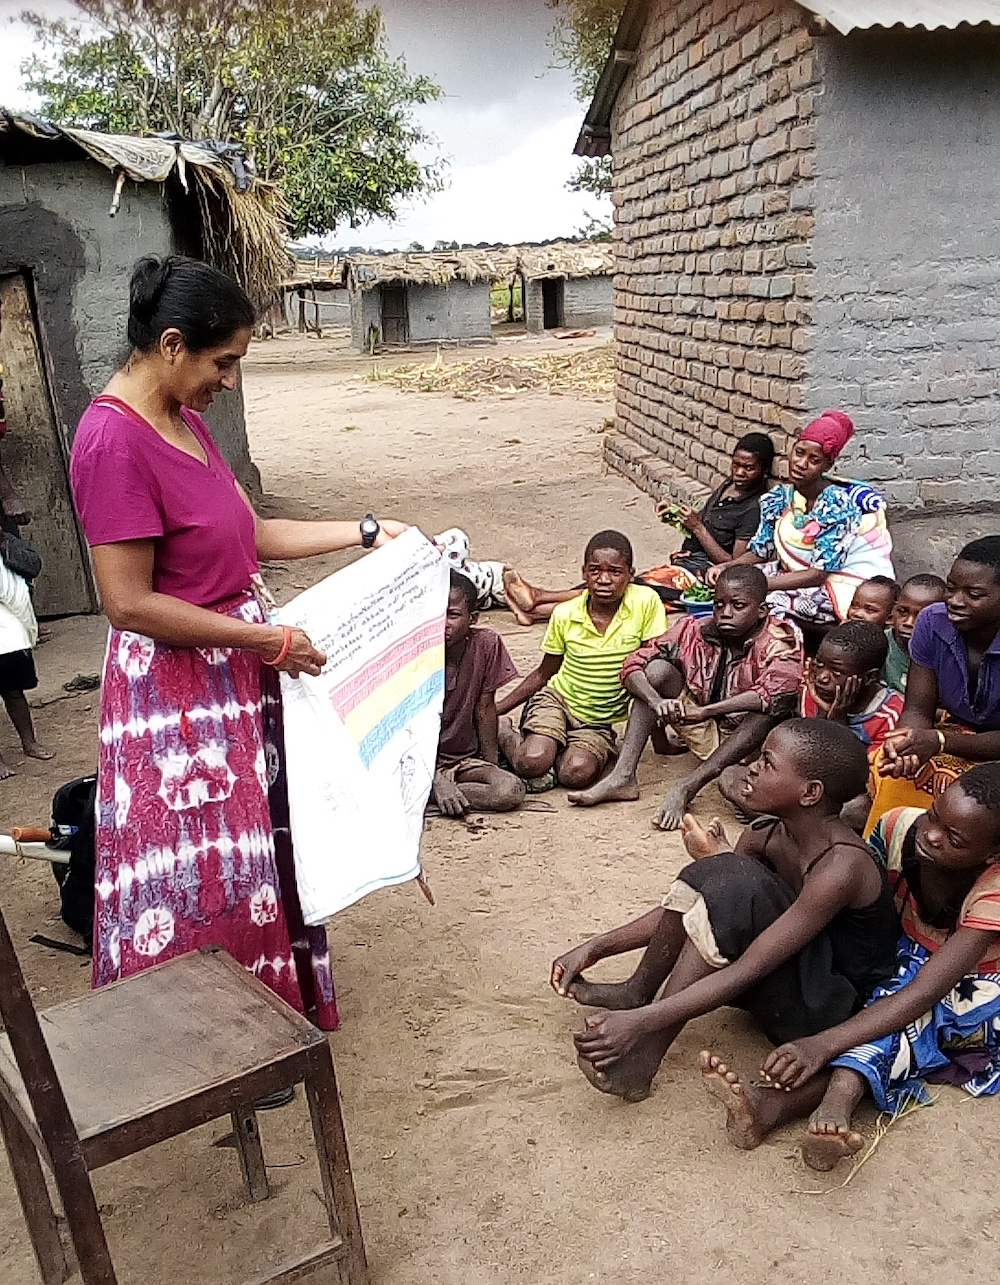 Vishakha Wavde holding maize sack in village in Malawi